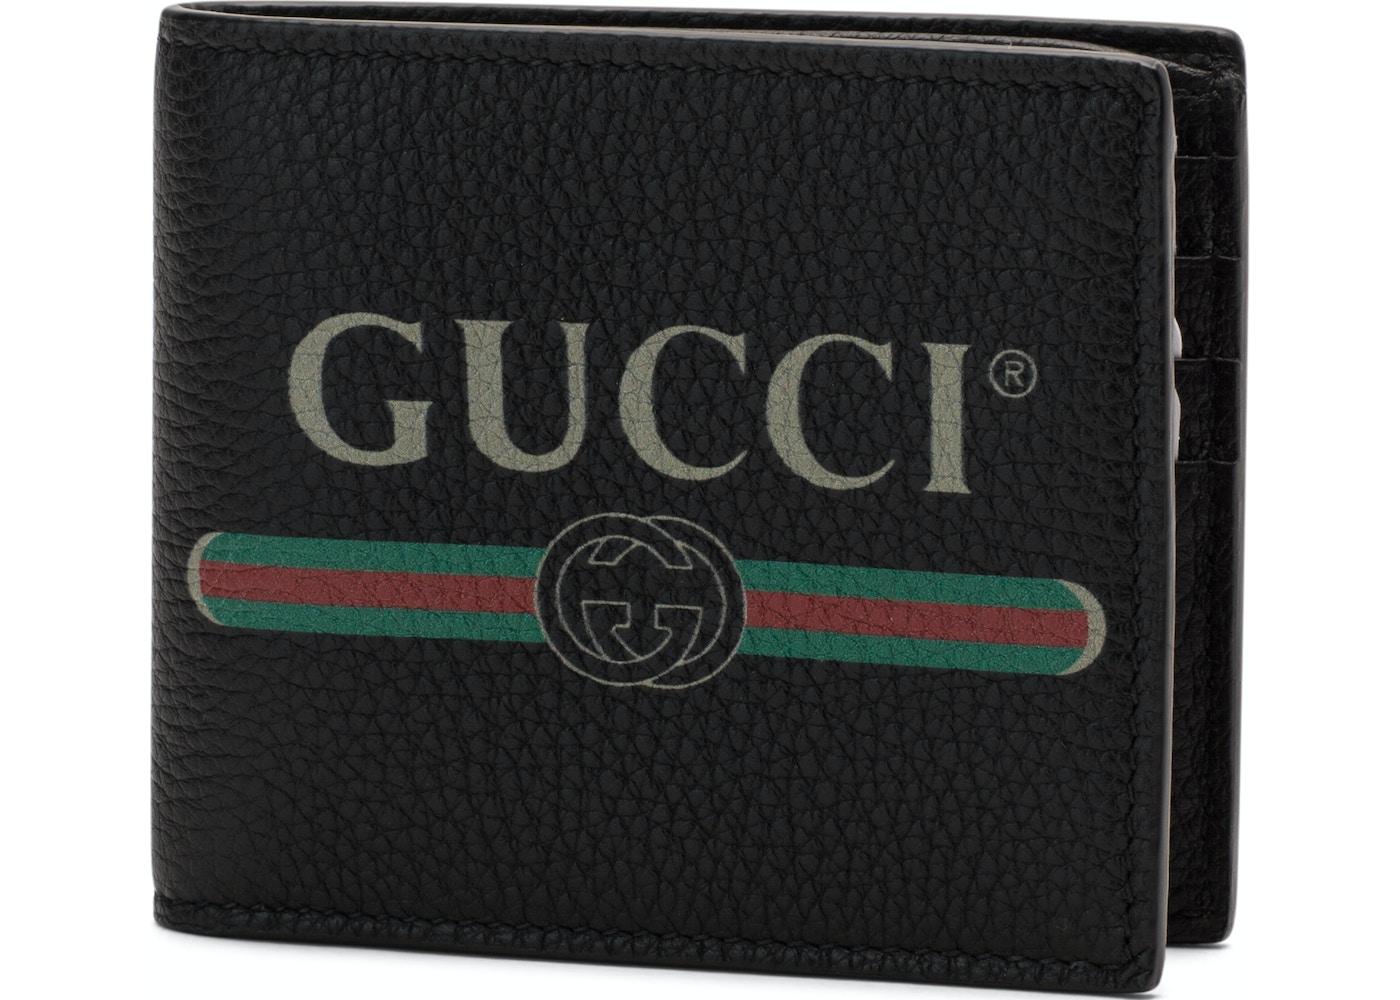 2c05c824289c Gucci Print Bifold Wallet Textured Leather (8 Card Slots) Black